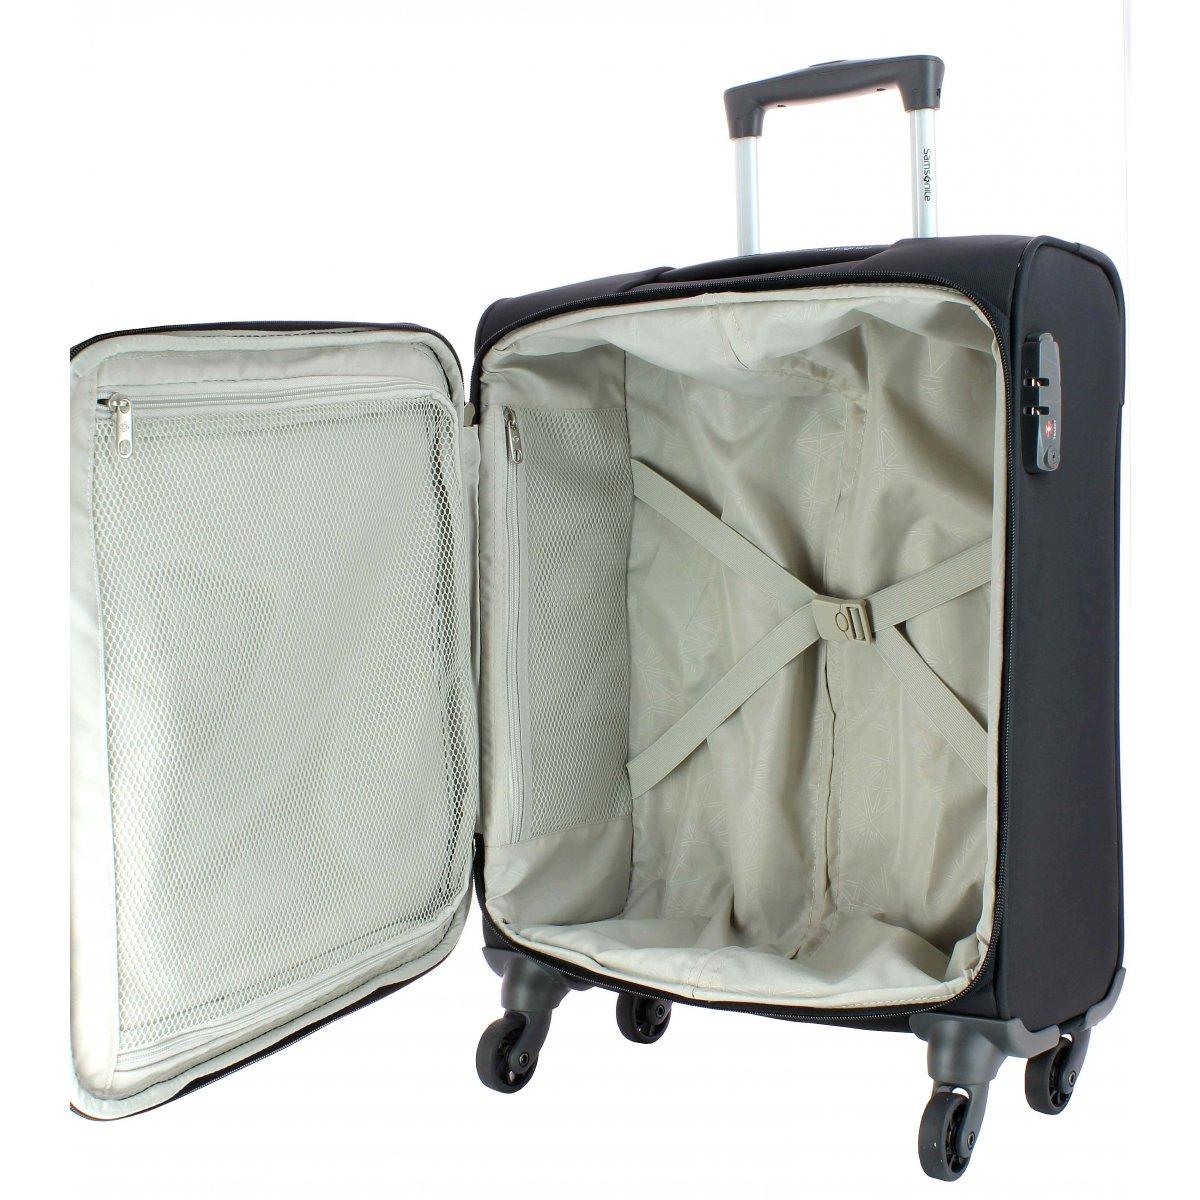 valise cabine samsonite ncs auva 55cm ncsauva20 couleur principale noir solde. Black Bedroom Furniture Sets. Home Design Ideas